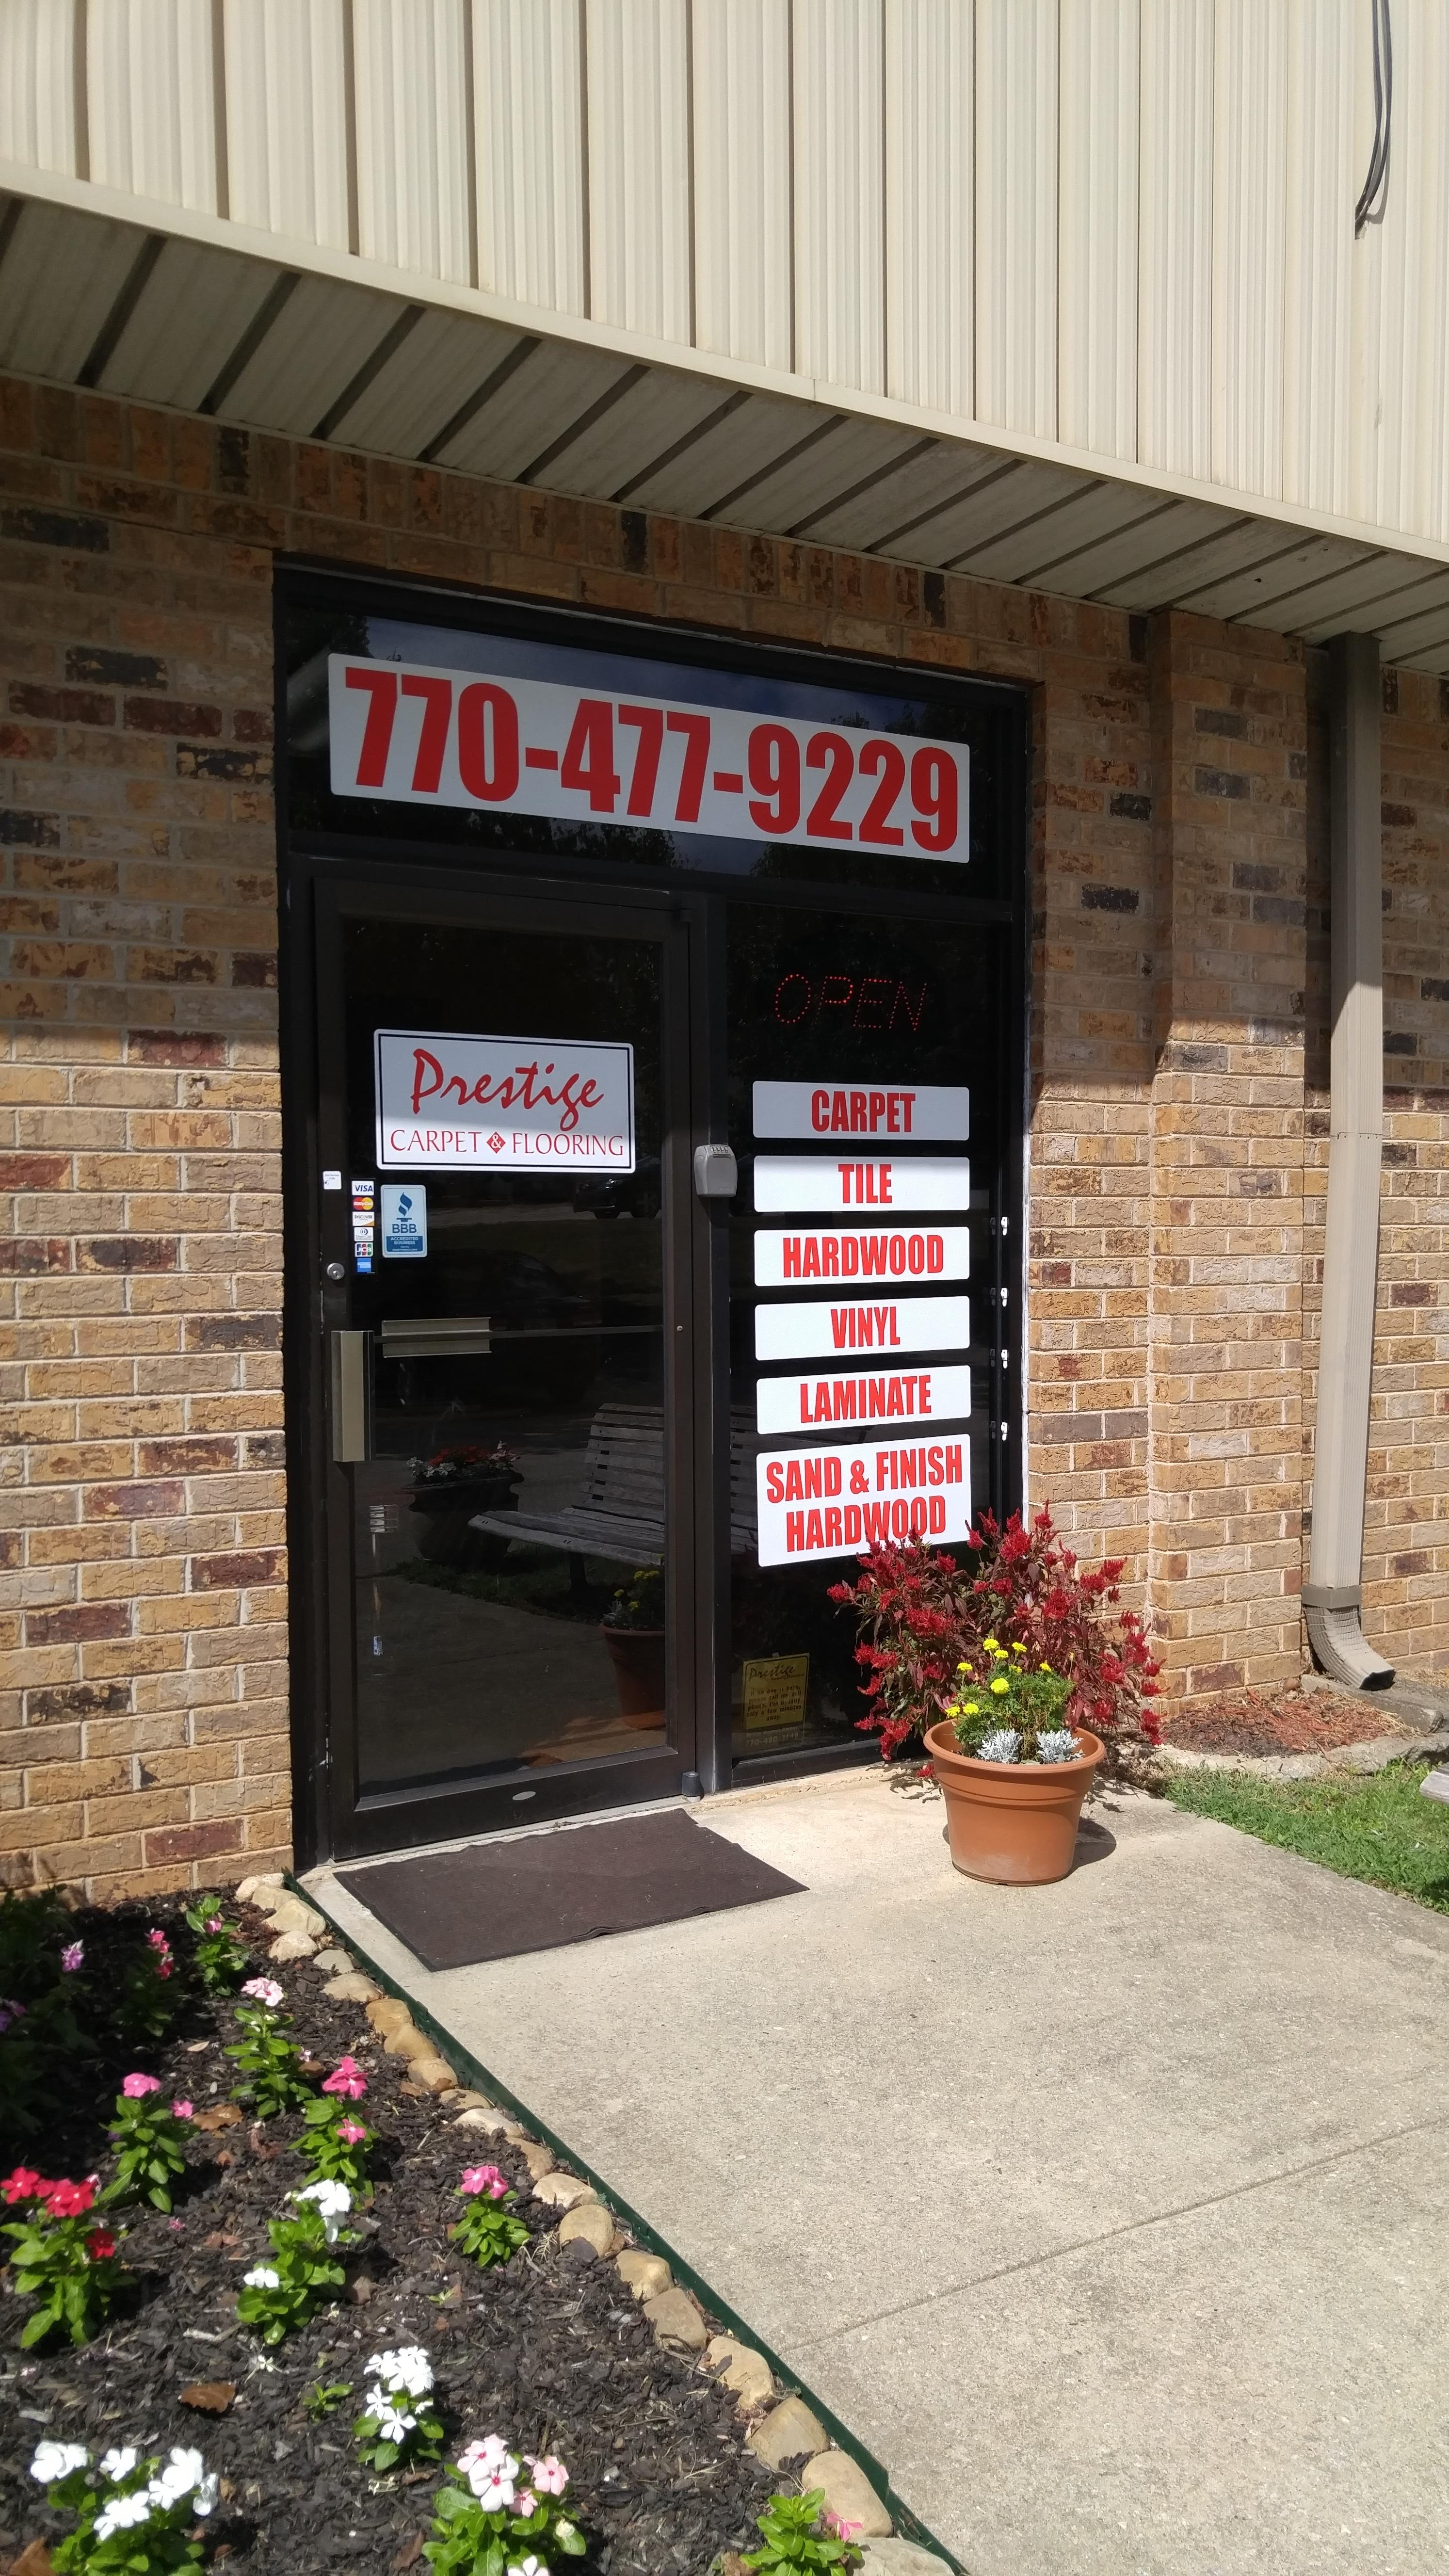 Prestige Carpet & Flooring Jonesboro (770)477-9229